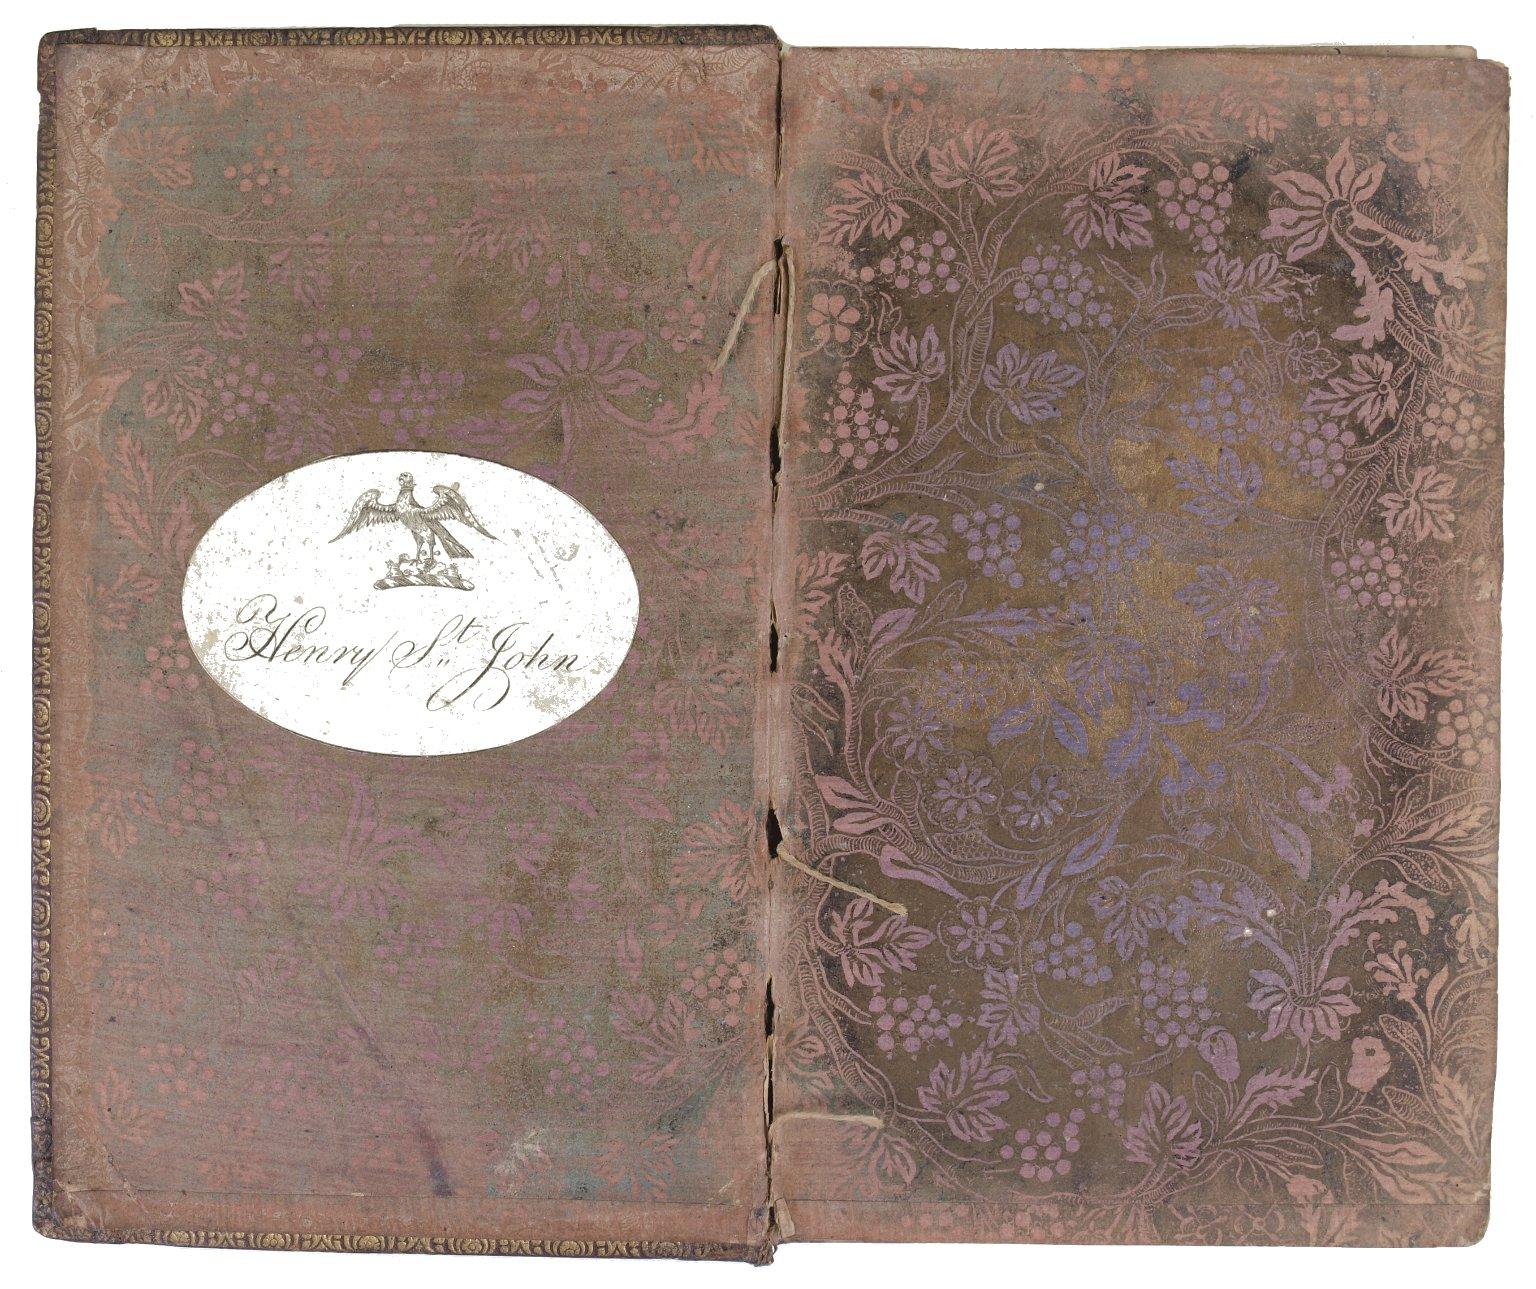 Inside front cover decorative paper, 145- 837q.